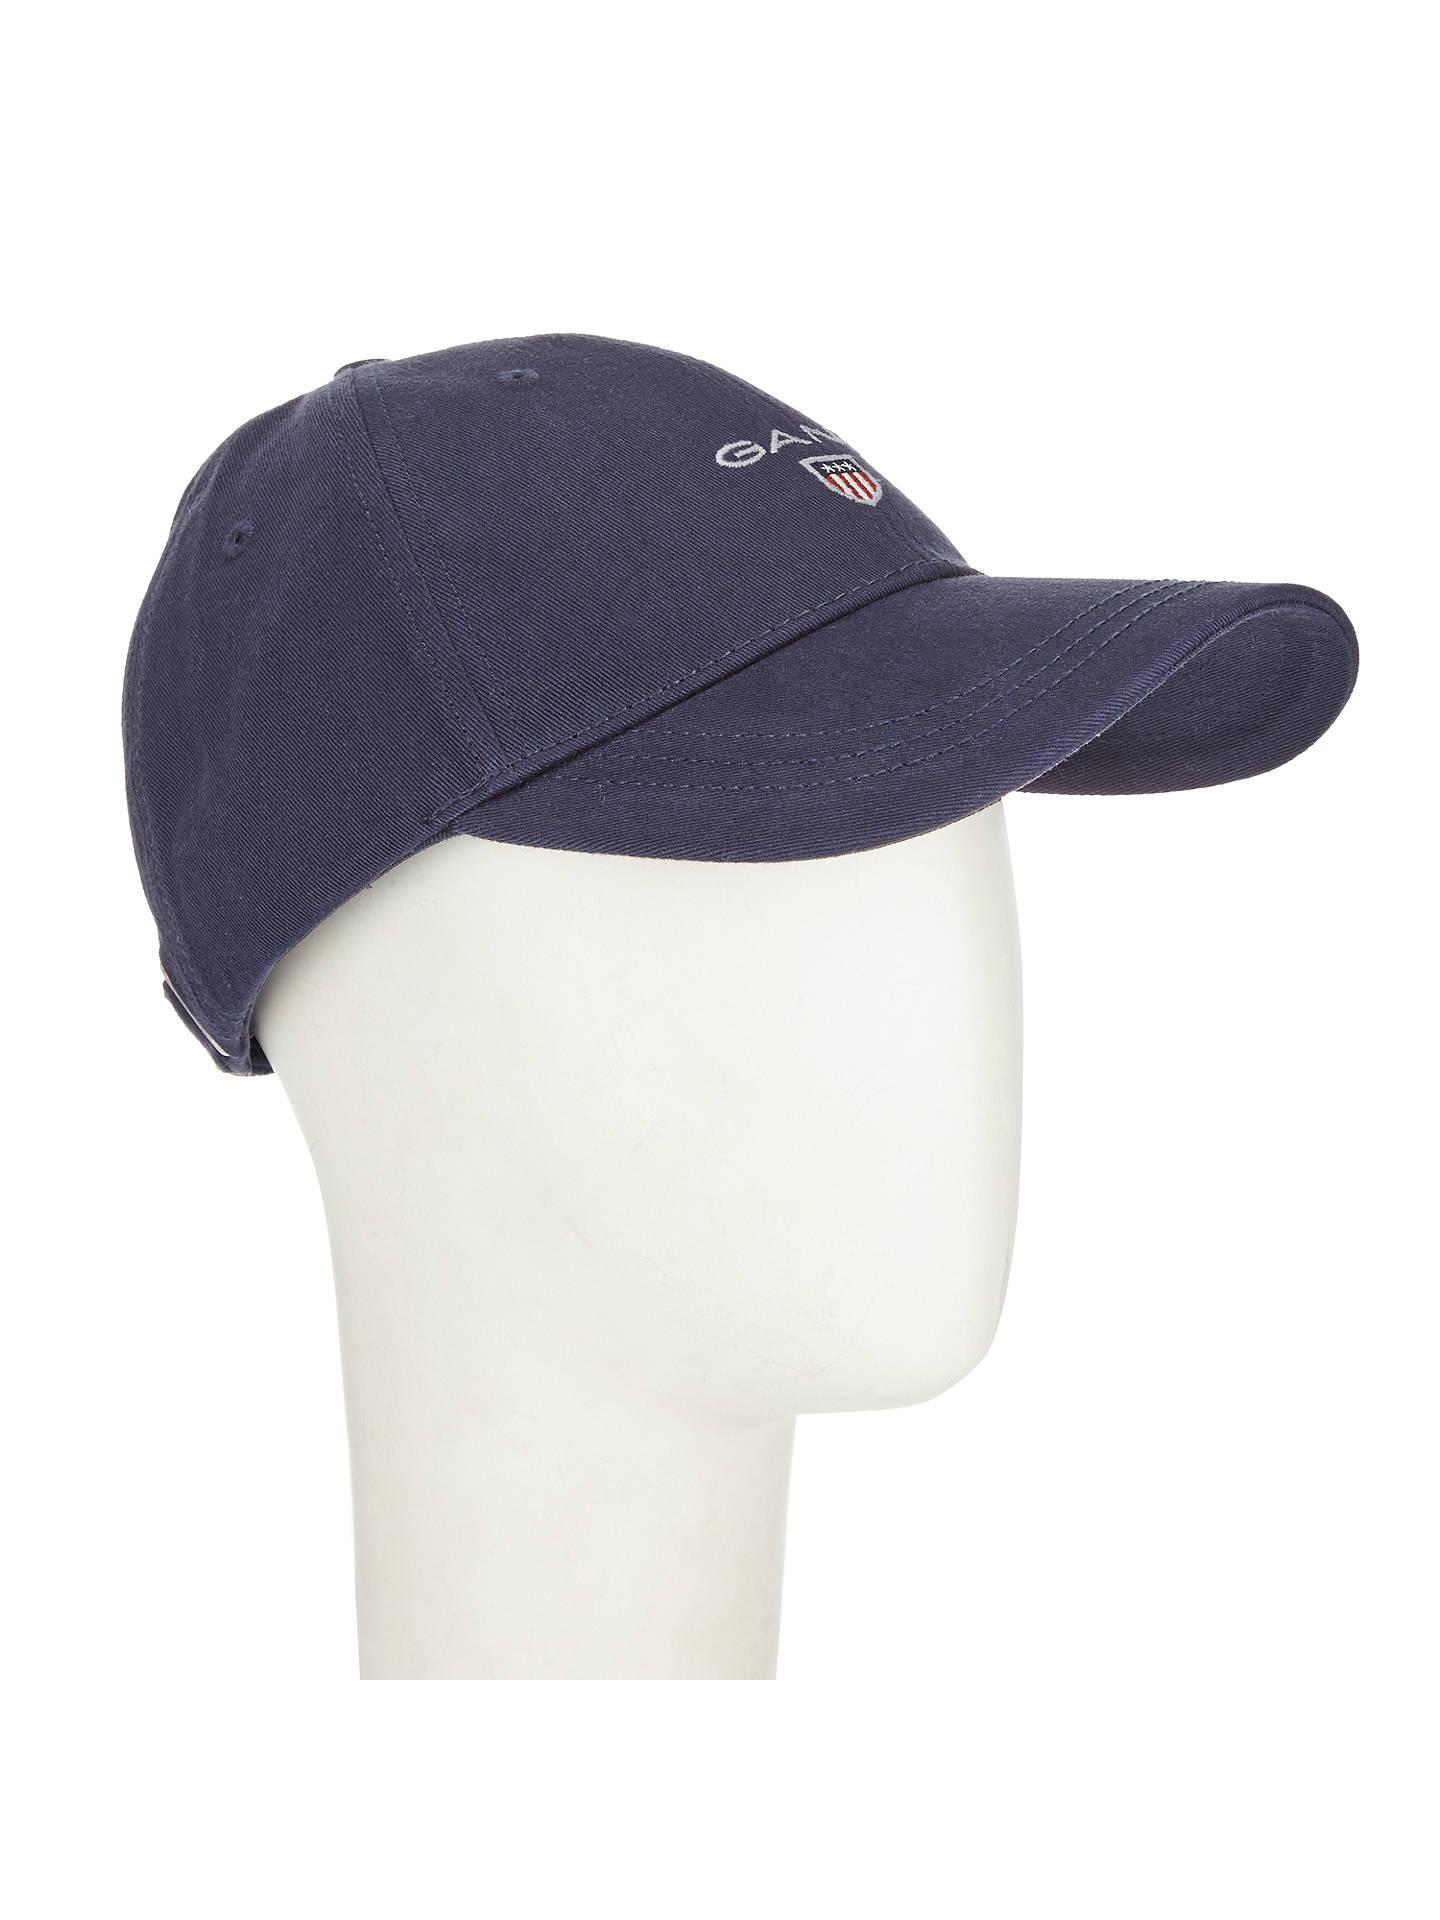 12b2dc17 ... Buy Gant Cotton Twill Baseball Cap, One Size, Navy Online at  johnlewis.com